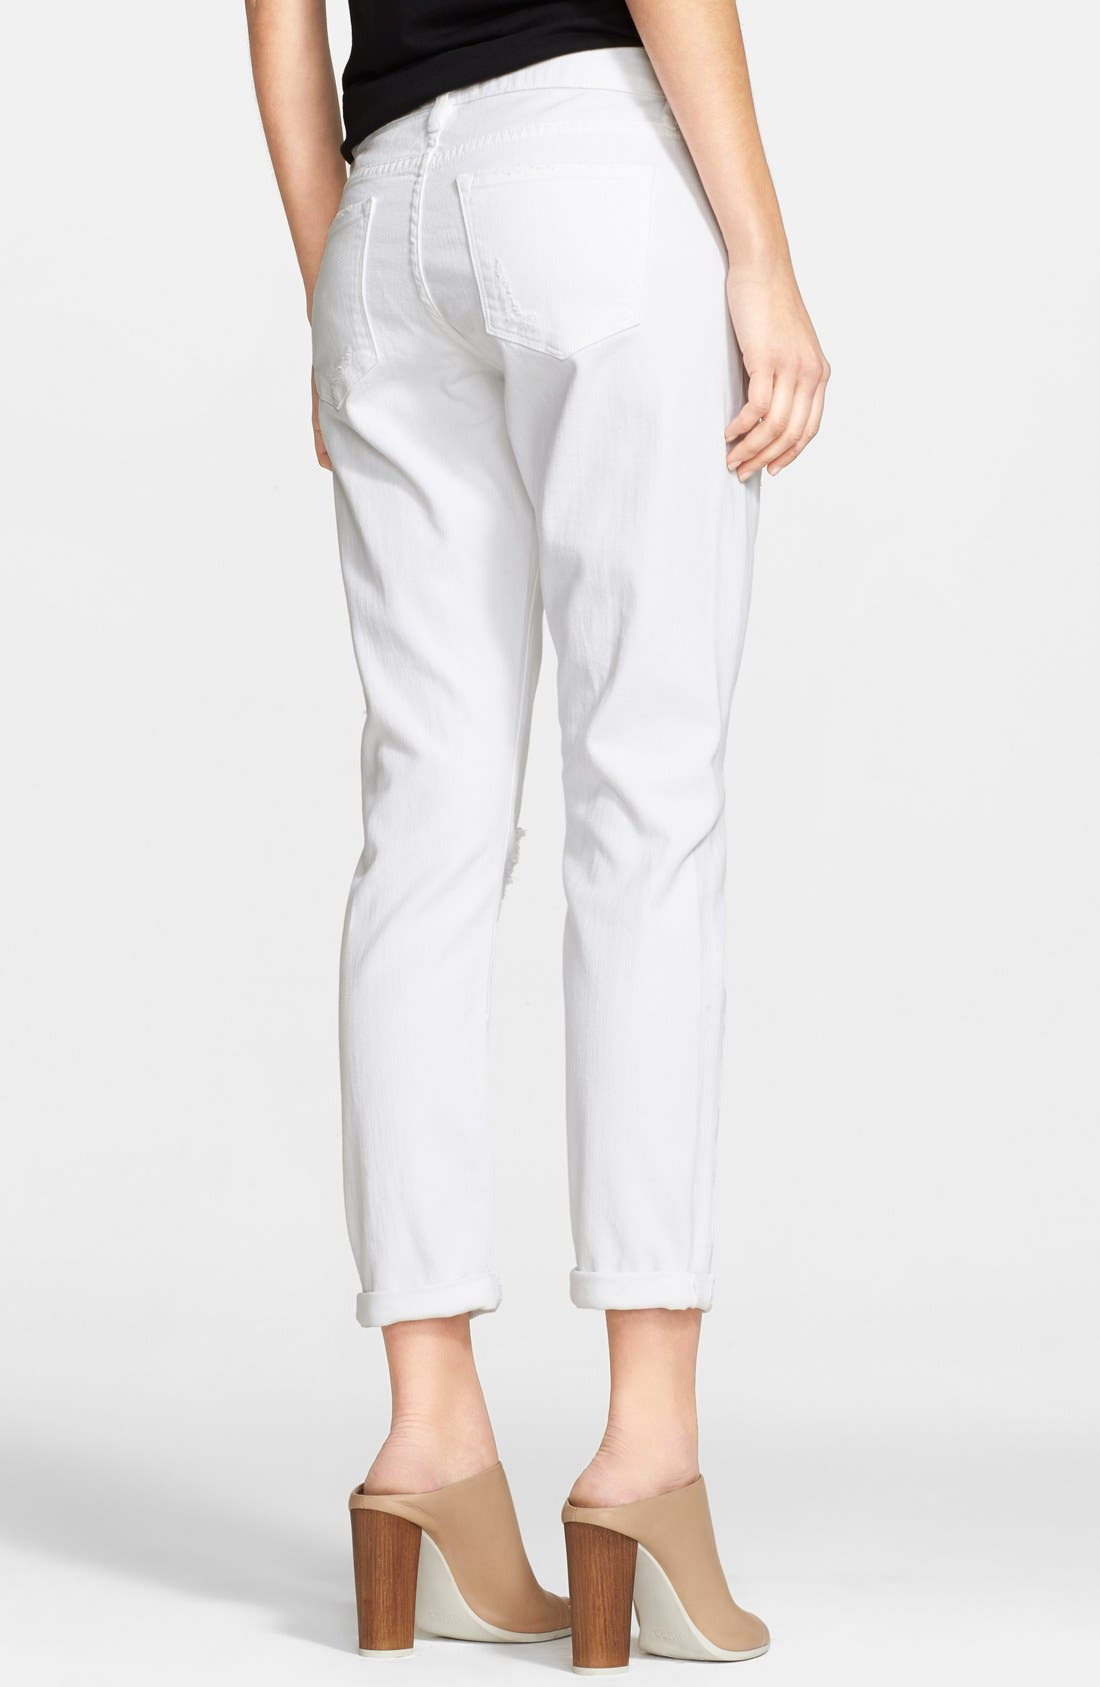 Alternate Image 2  - Frame Denim 'Le Garcon' Destroyed Slim Boyfriend Jeans (Rip Blanc)